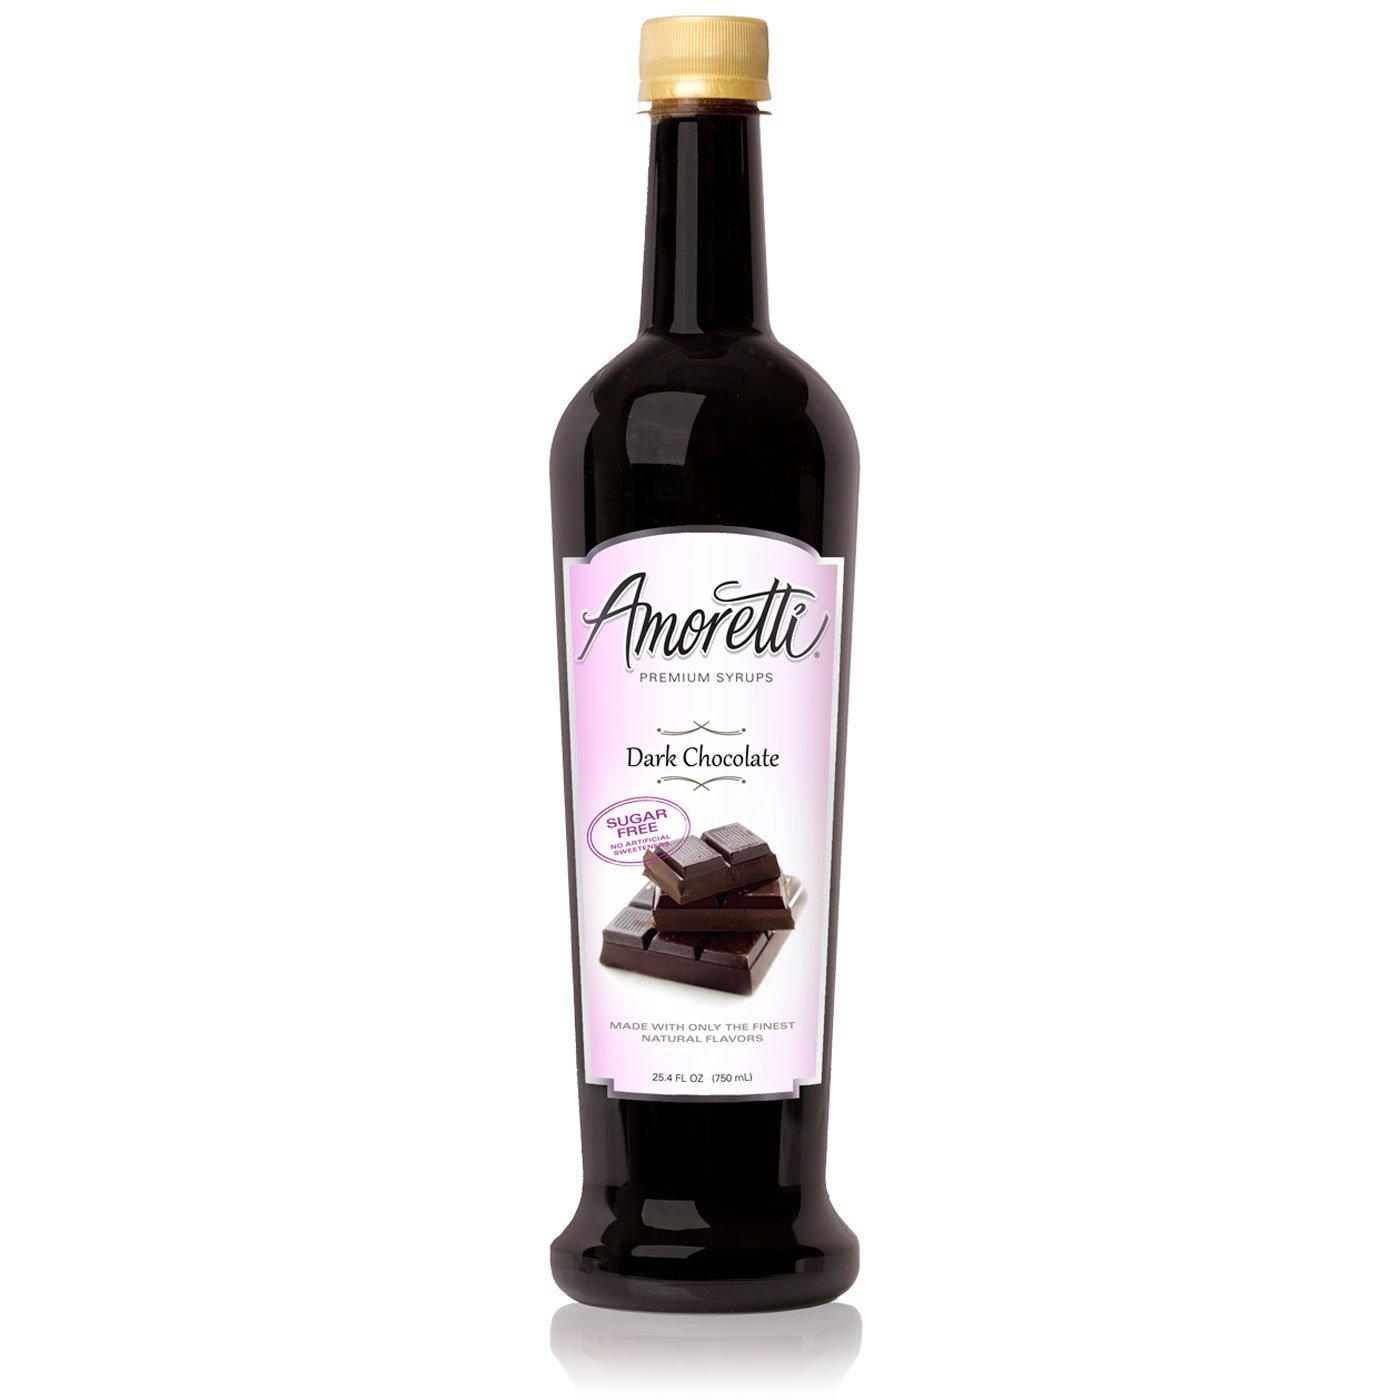 Amoretti Premium Sugar Free Flavoring, Dark Chocolate, 25.4 Ounce